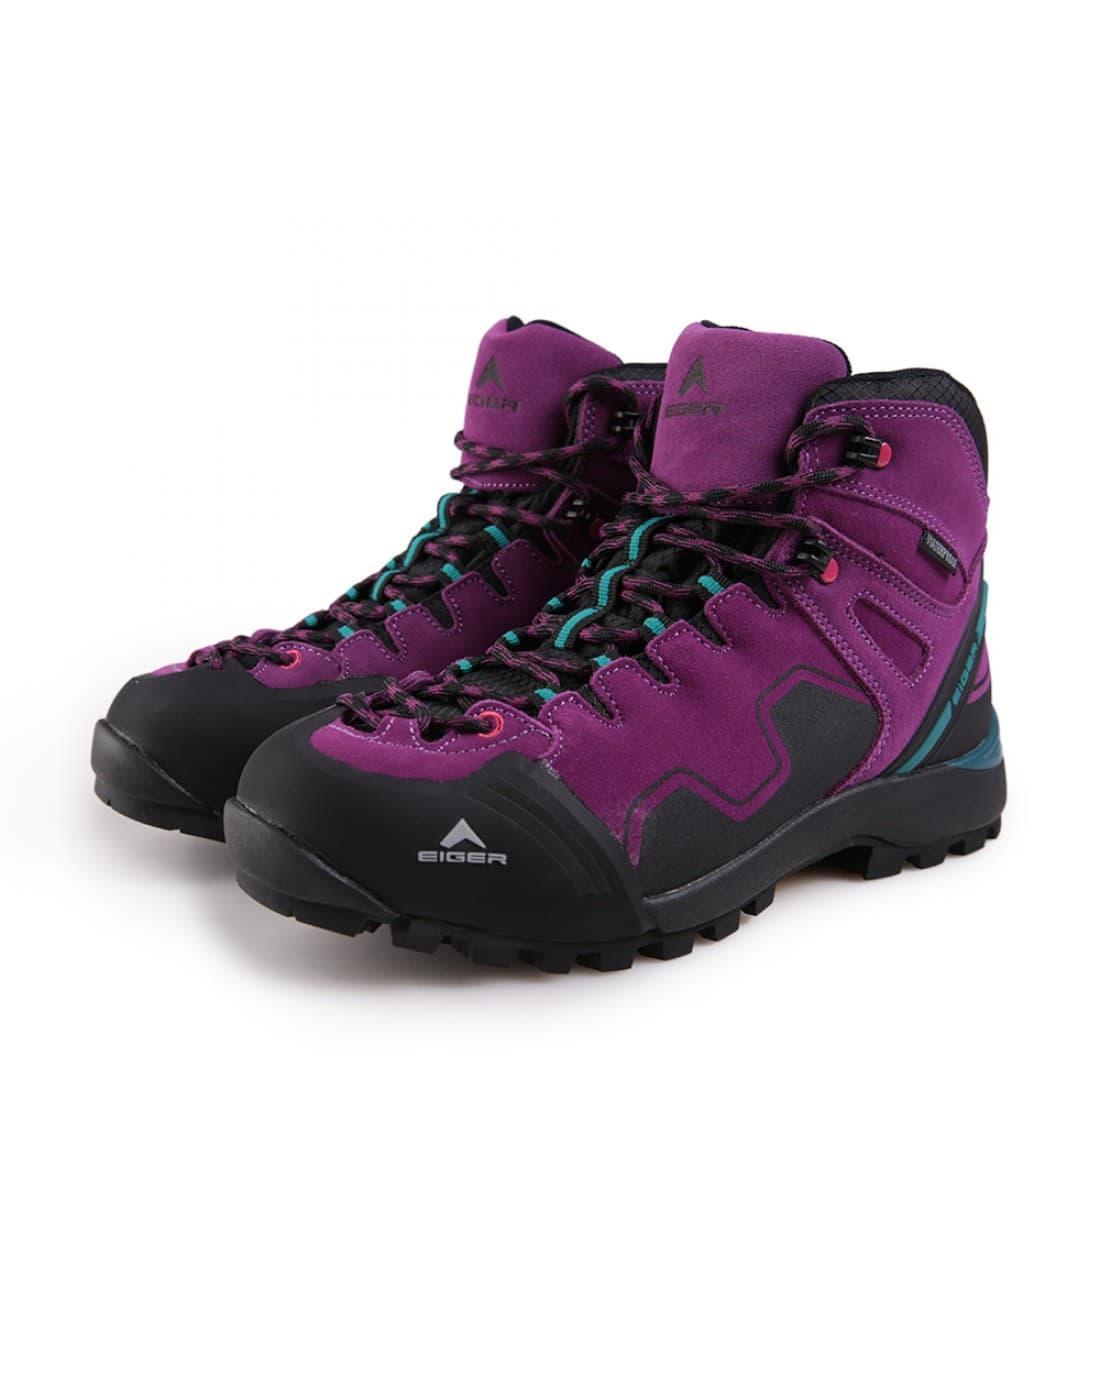 Sepatu Gunung Wanita Eiger Walton // Sepatu Gunung Waterproof Original - Turquoise, 37